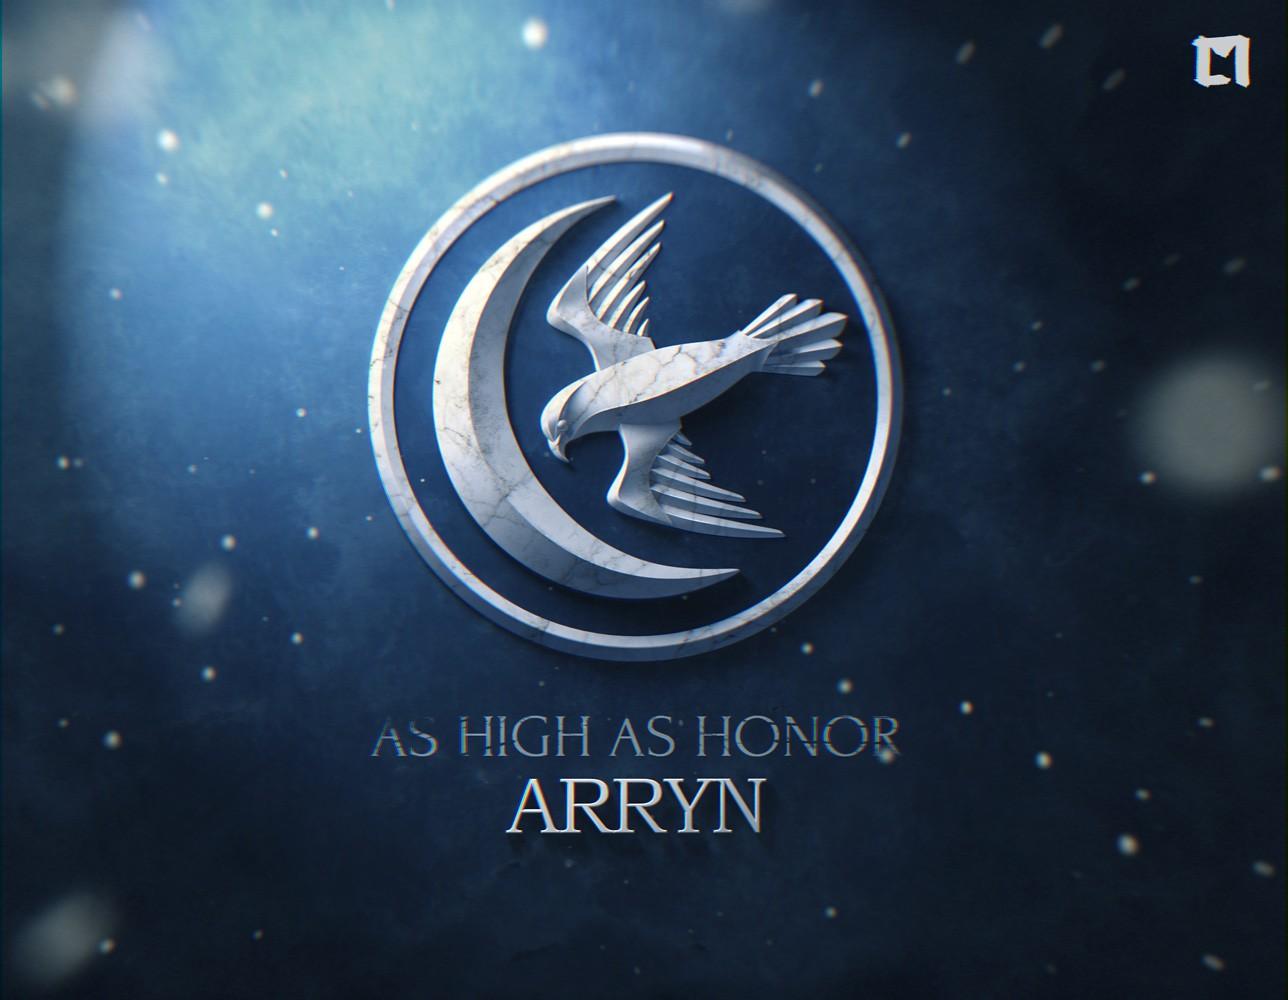 Wallpaper Illustration Vehicle Logo Circle Game Of Thrones